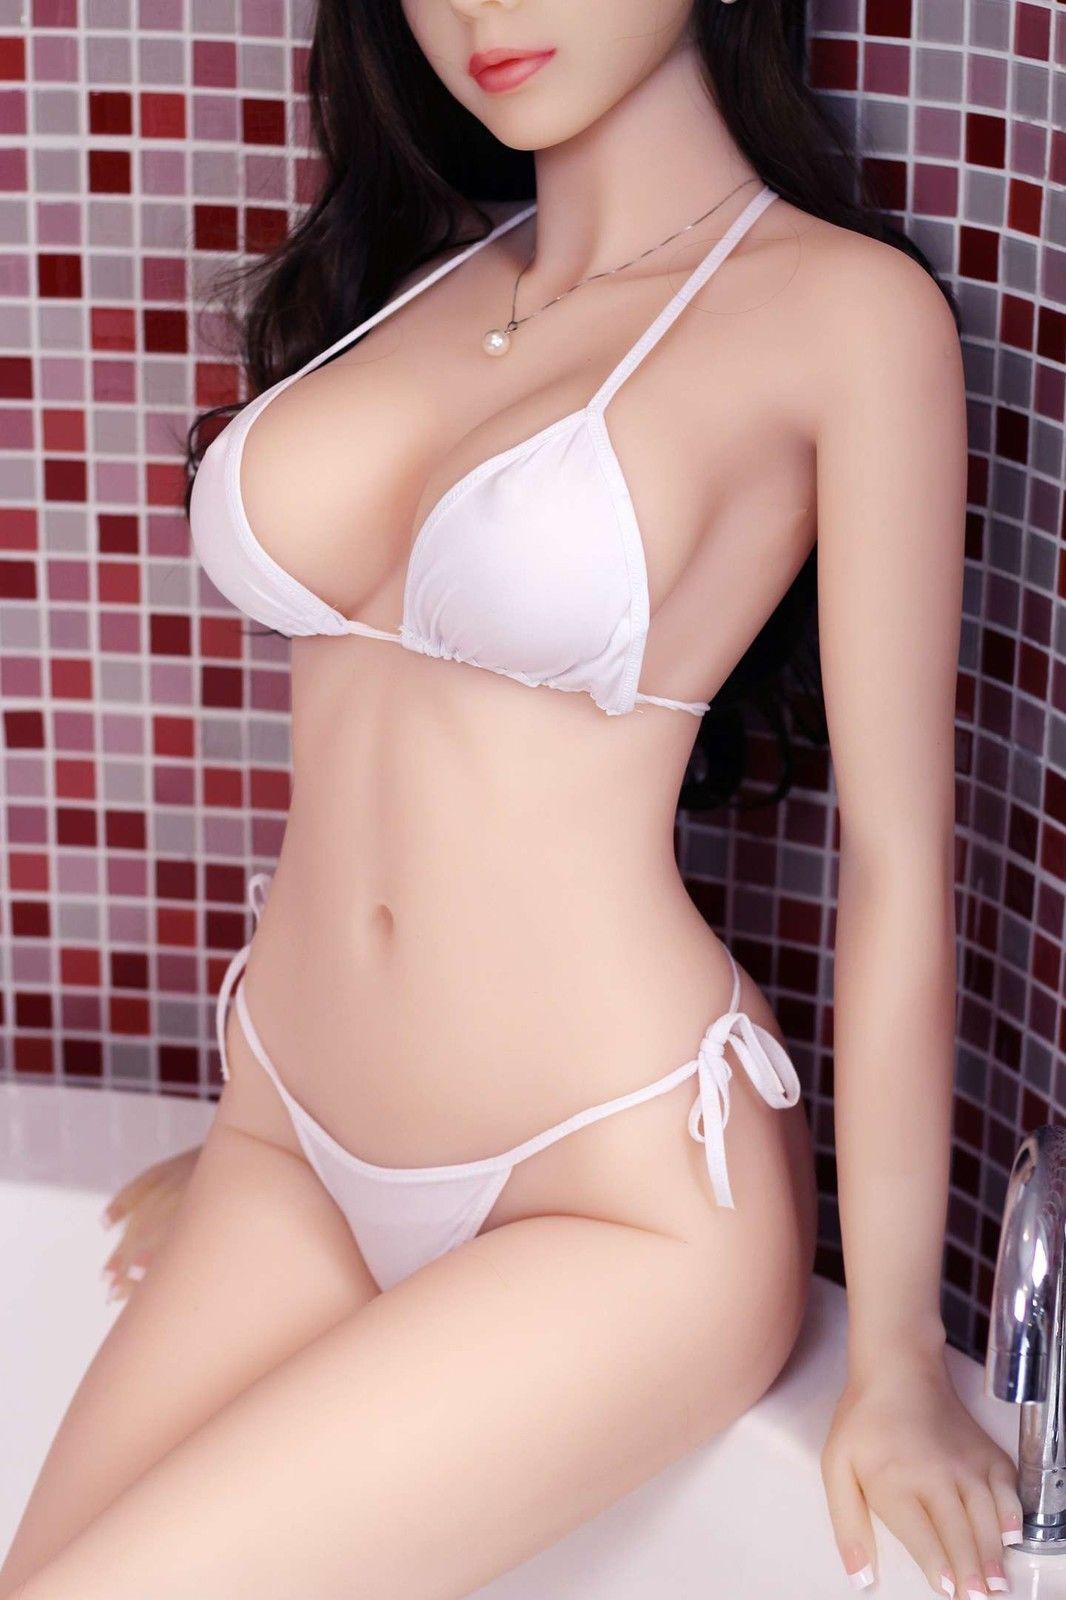 Image of [#023] BIG SALE | Celina